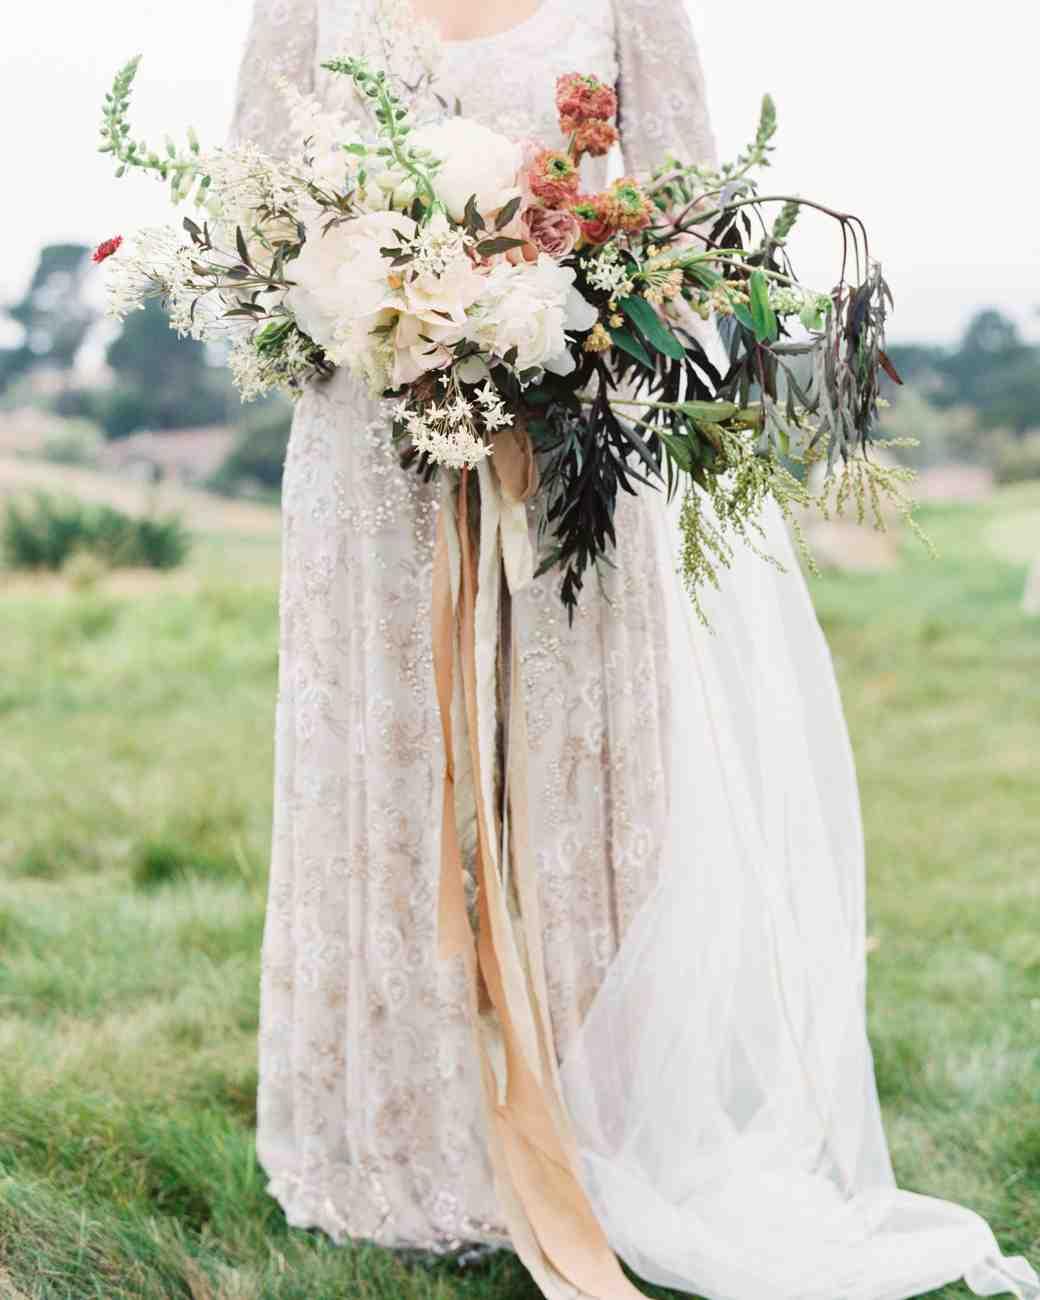 Original wedding design